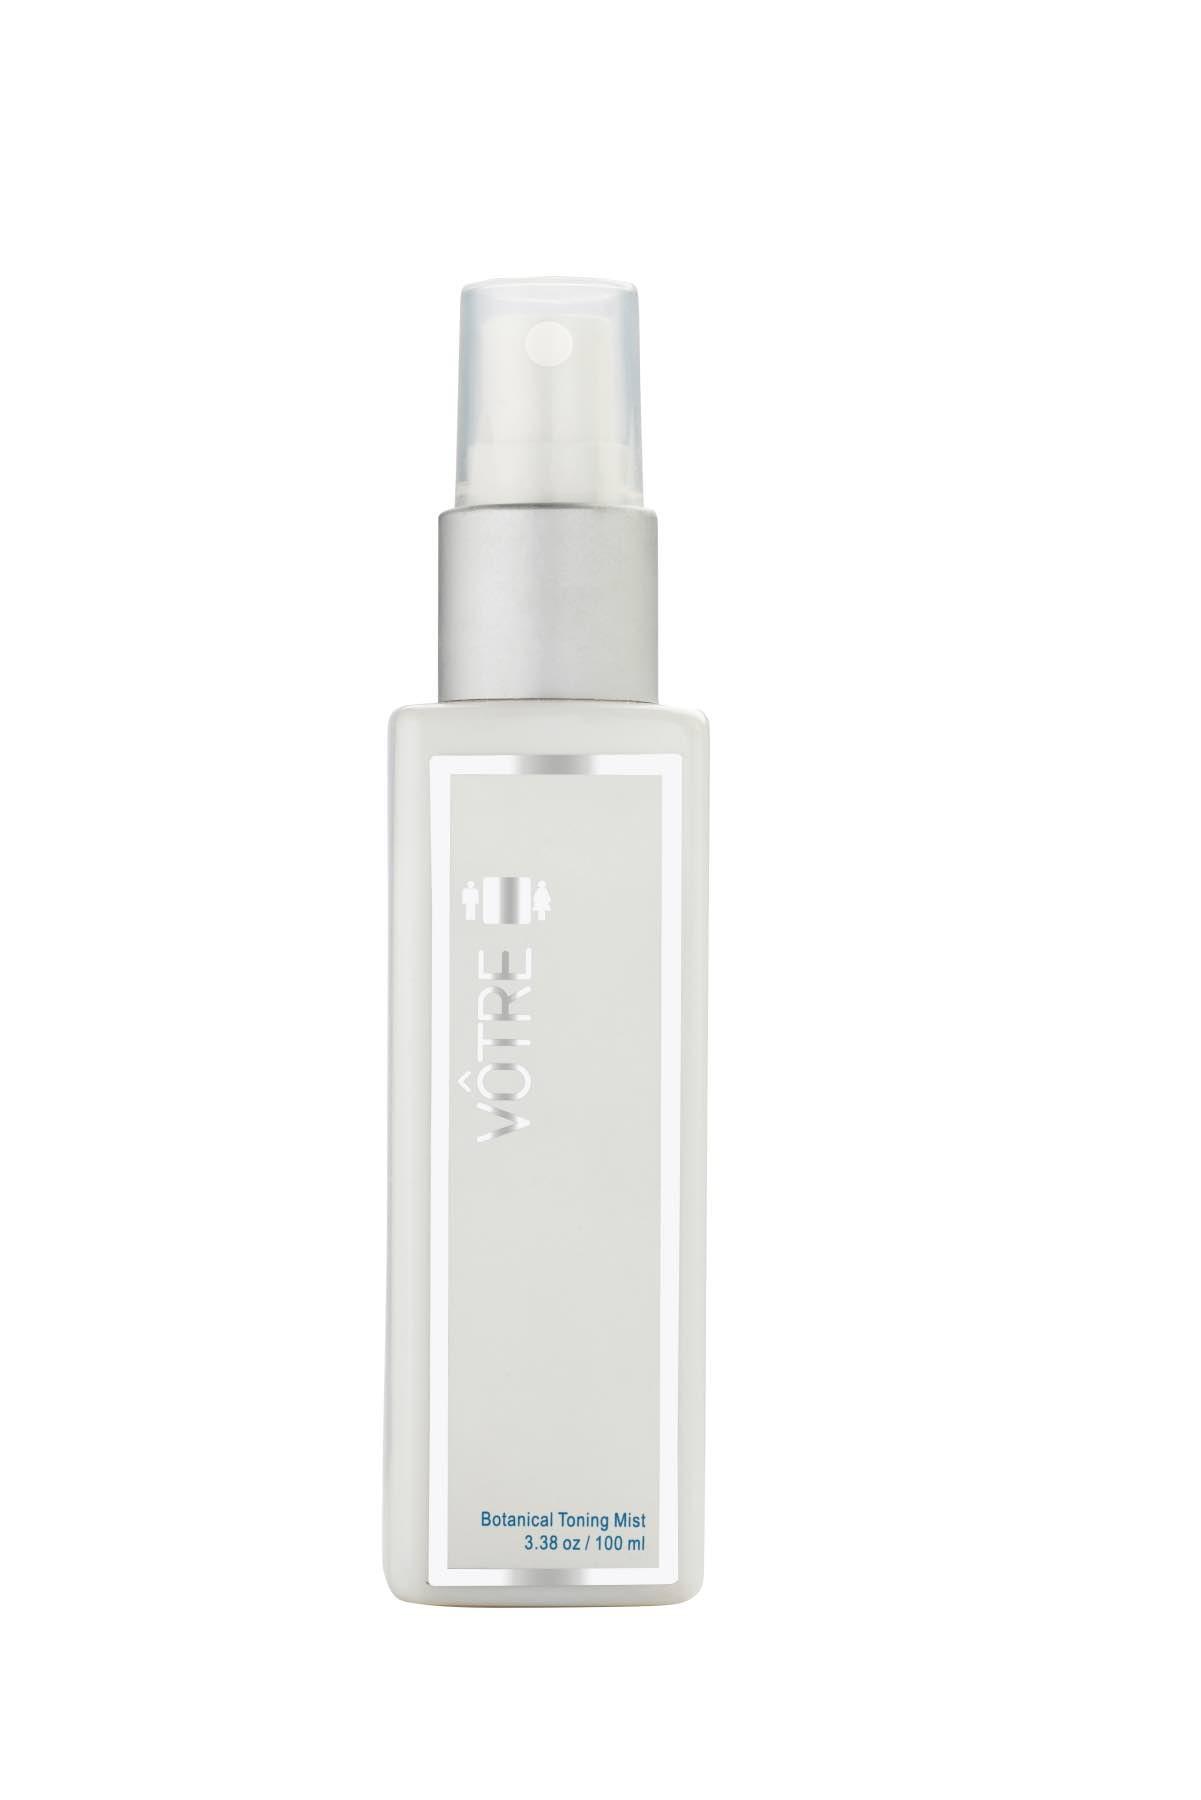 toners for dry skin-Votre Botanical Toning MistVotre Botanical Toning Mist